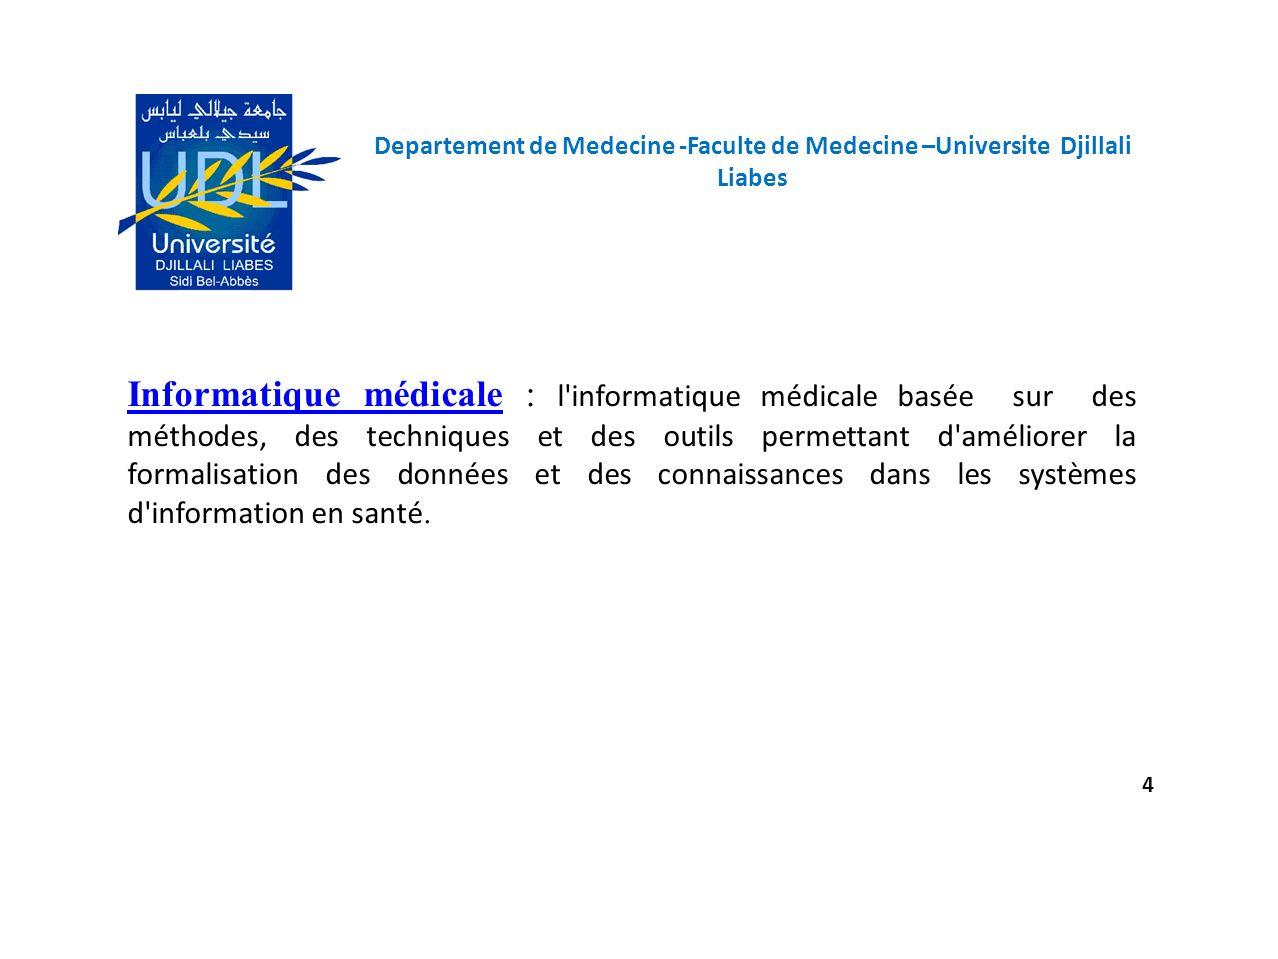 Departement de Medecine -Faculte de Medecine –Universite Djillali Liabes